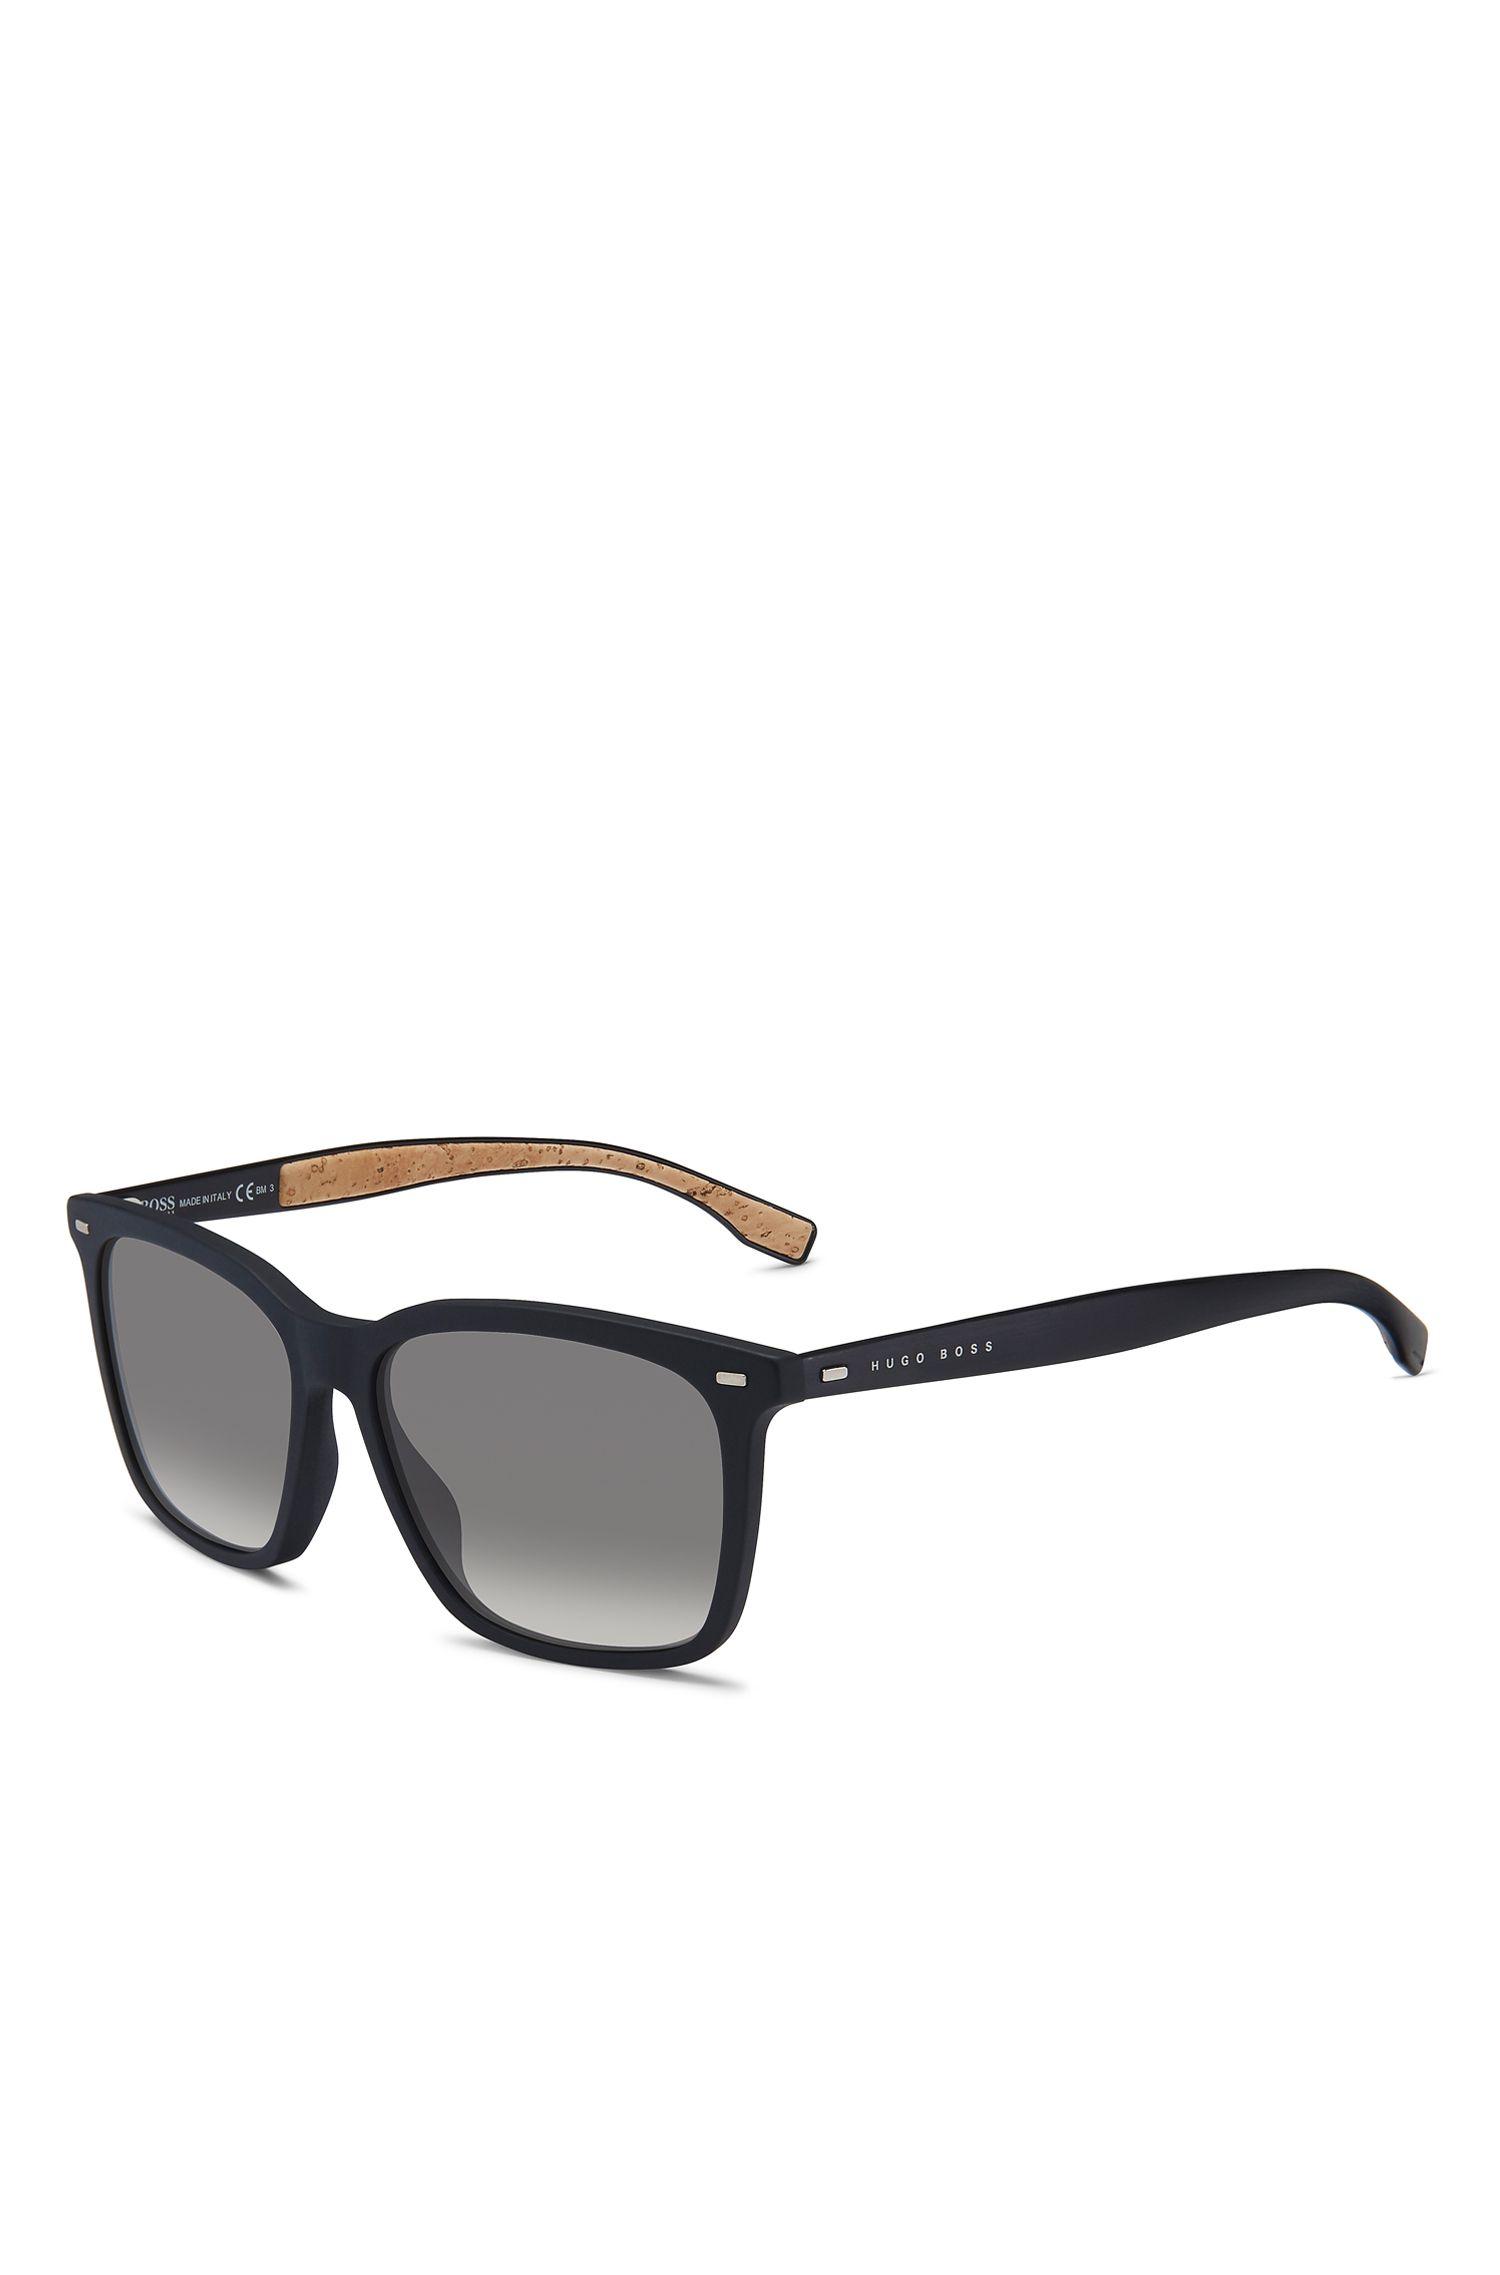 Black Acetate Rectangular Sunglasses | BOSS 0883S